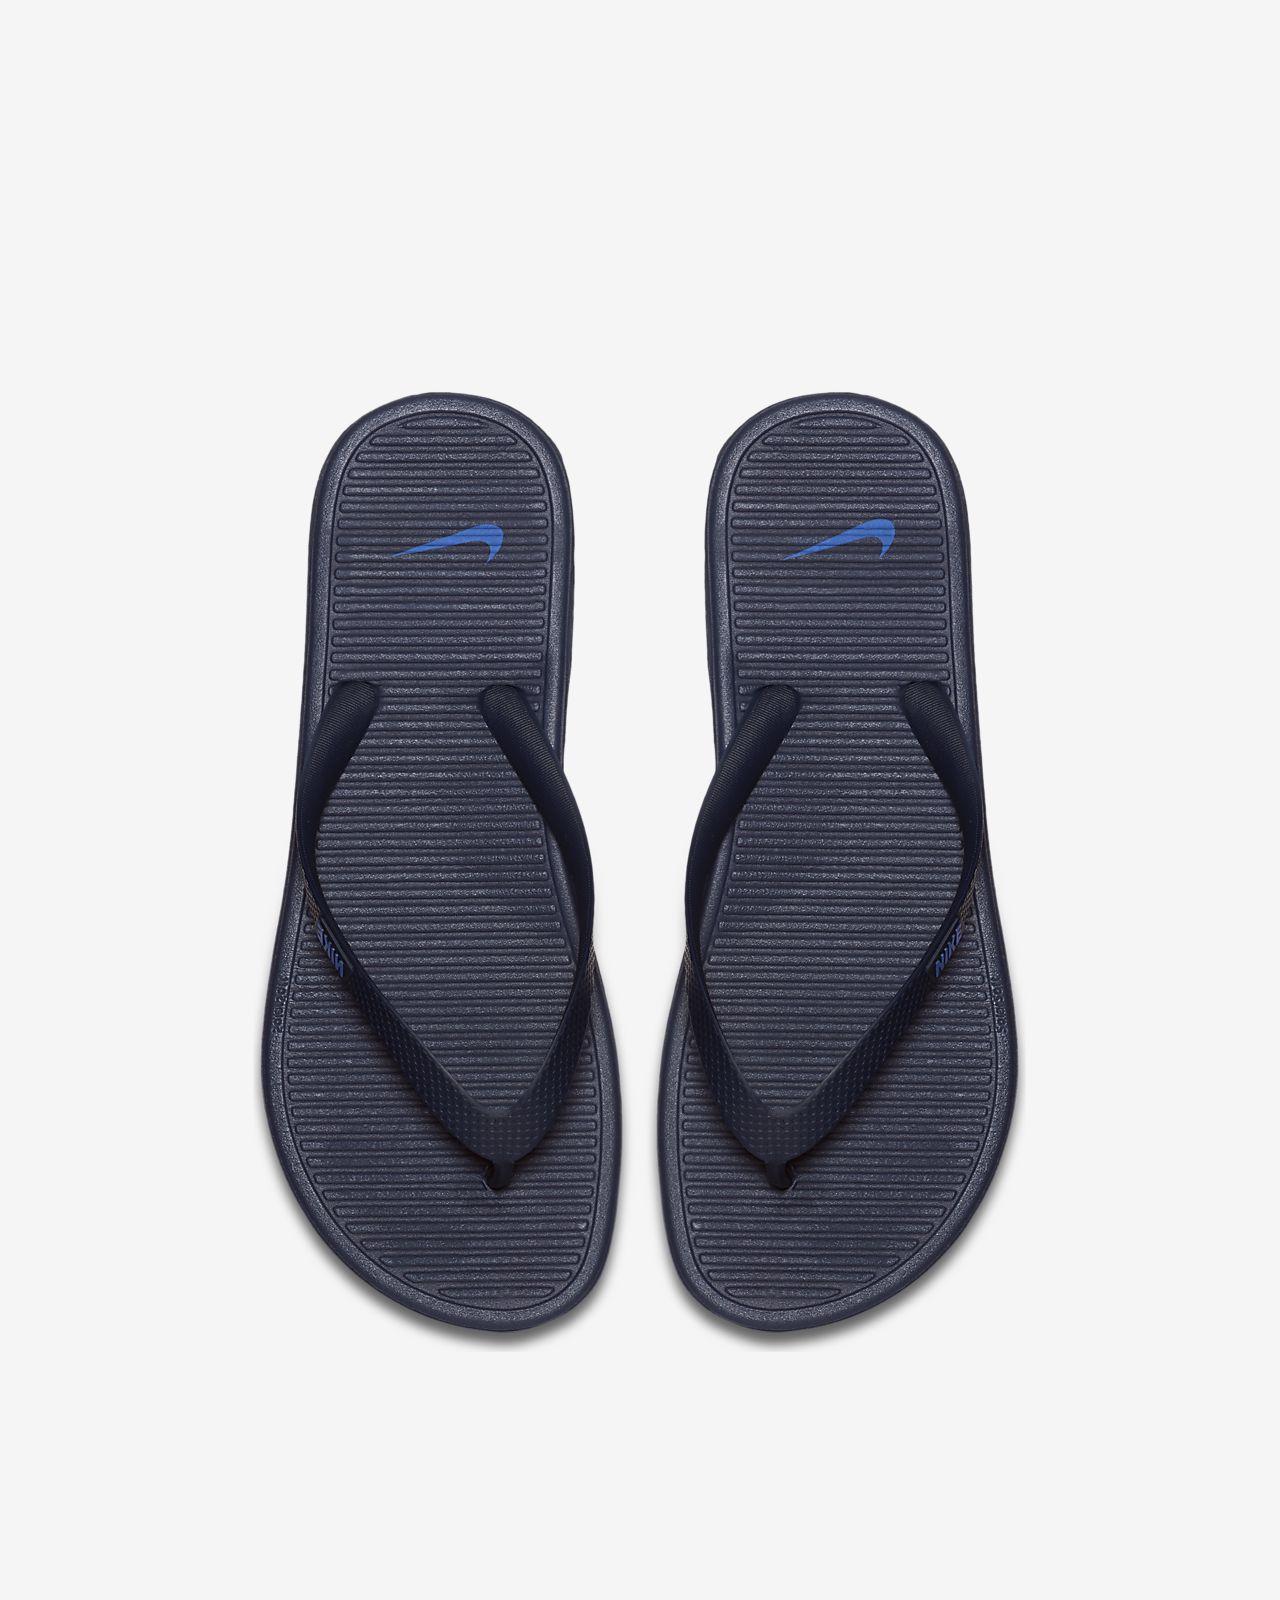 9fc2faa0c55 Tong Nike Solarsoft II pour Homme. Nike.com FR